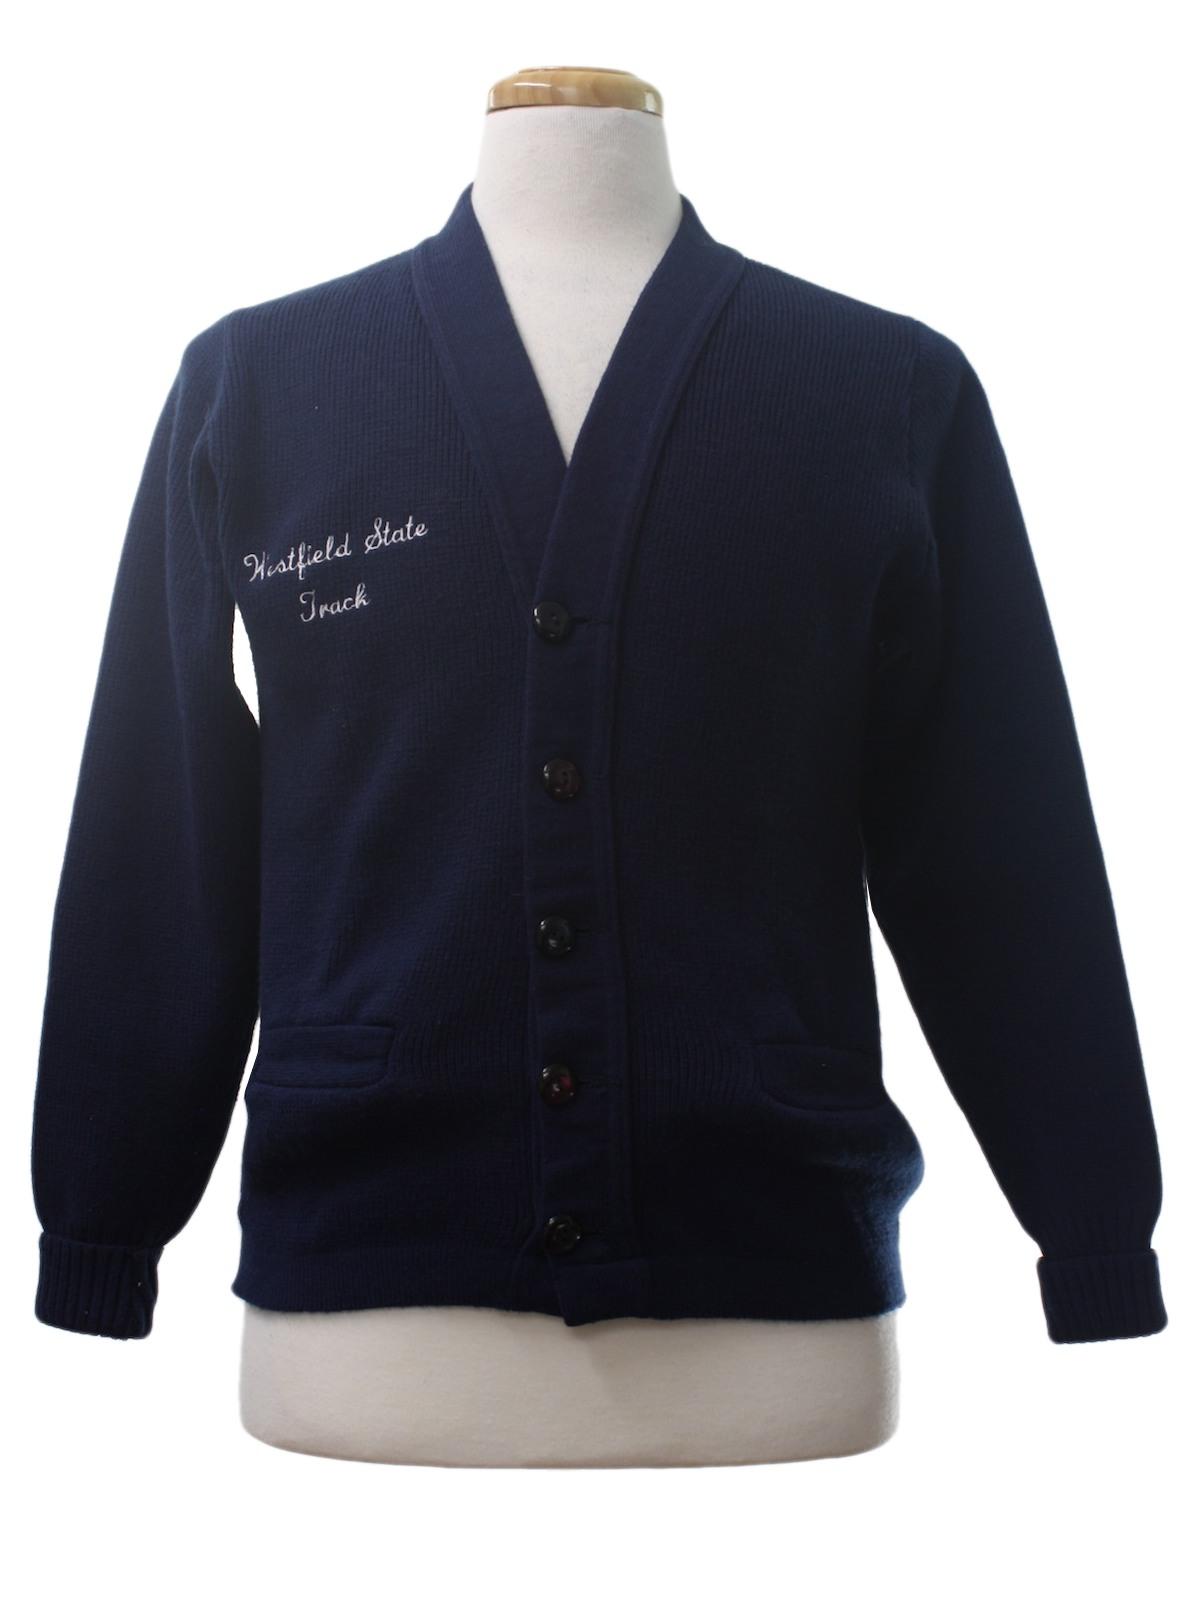 Vintage 80s Caridgan Sweater 80s East Tenn Mens Navy Blue